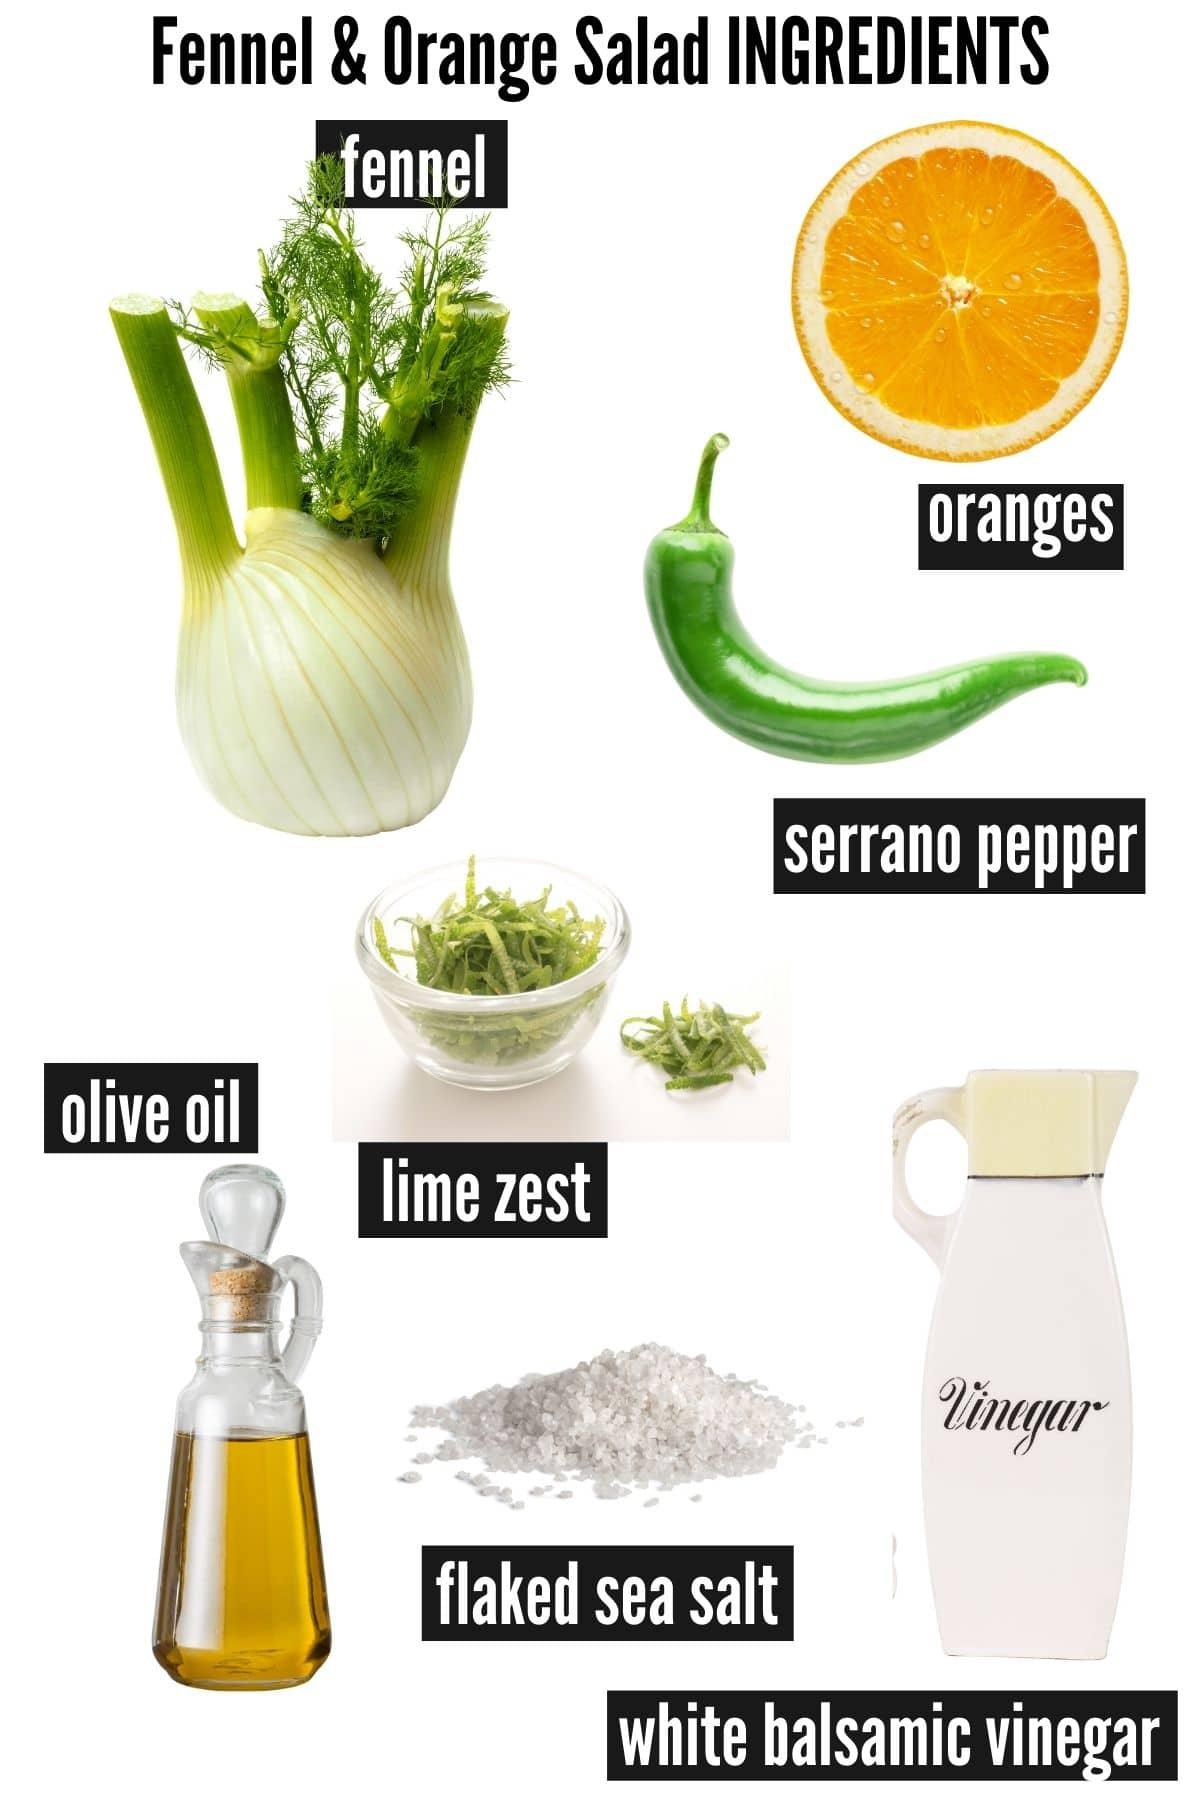 fennel orange salad ingredients